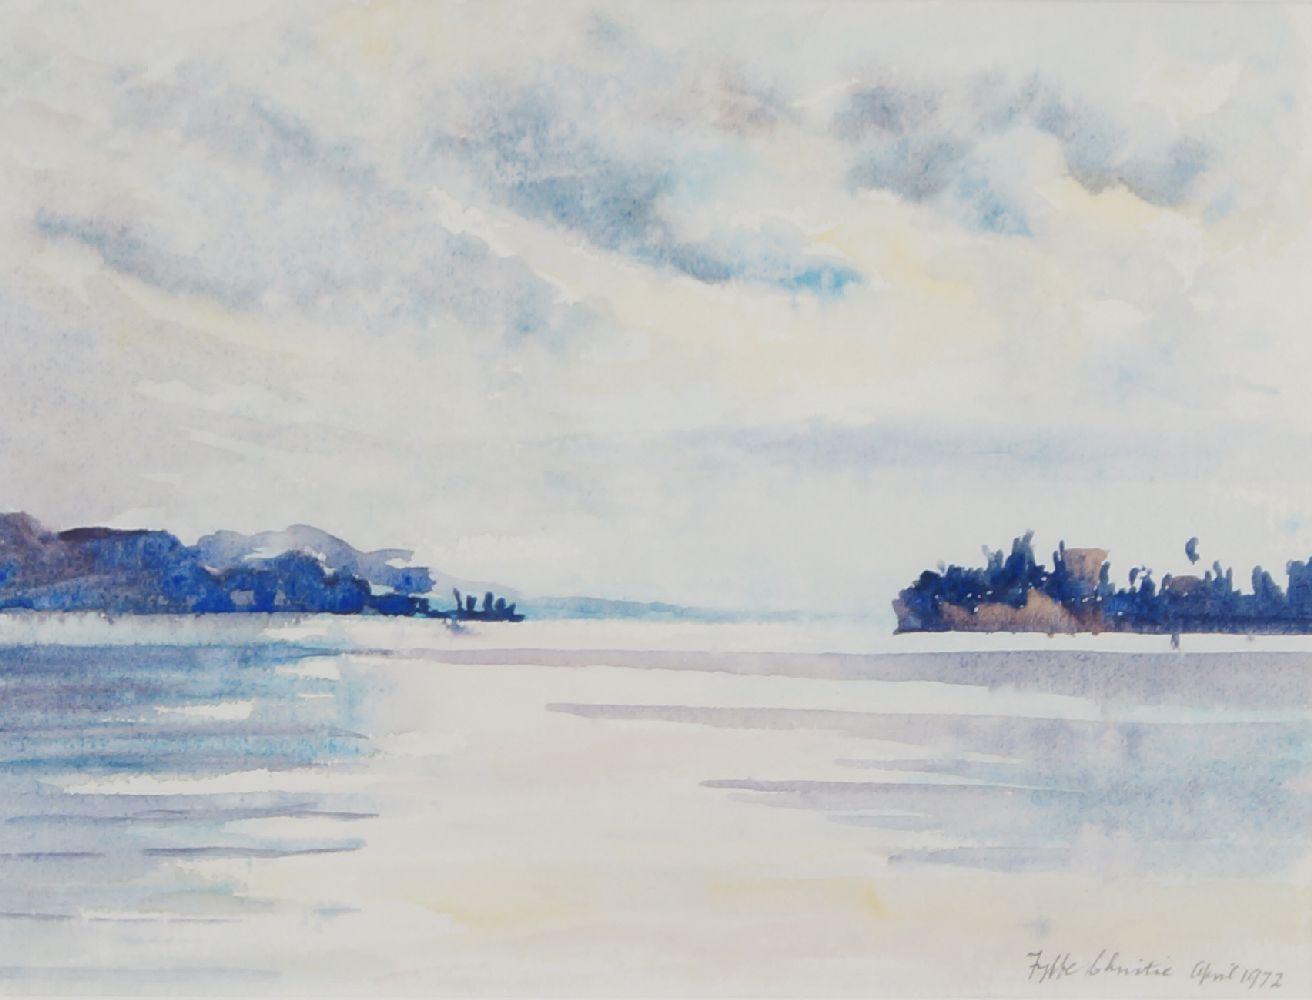 Fyffe Christie, British 1918-1979- South Coast, Folkestone, Kent; watercolour, 13x22cm: together